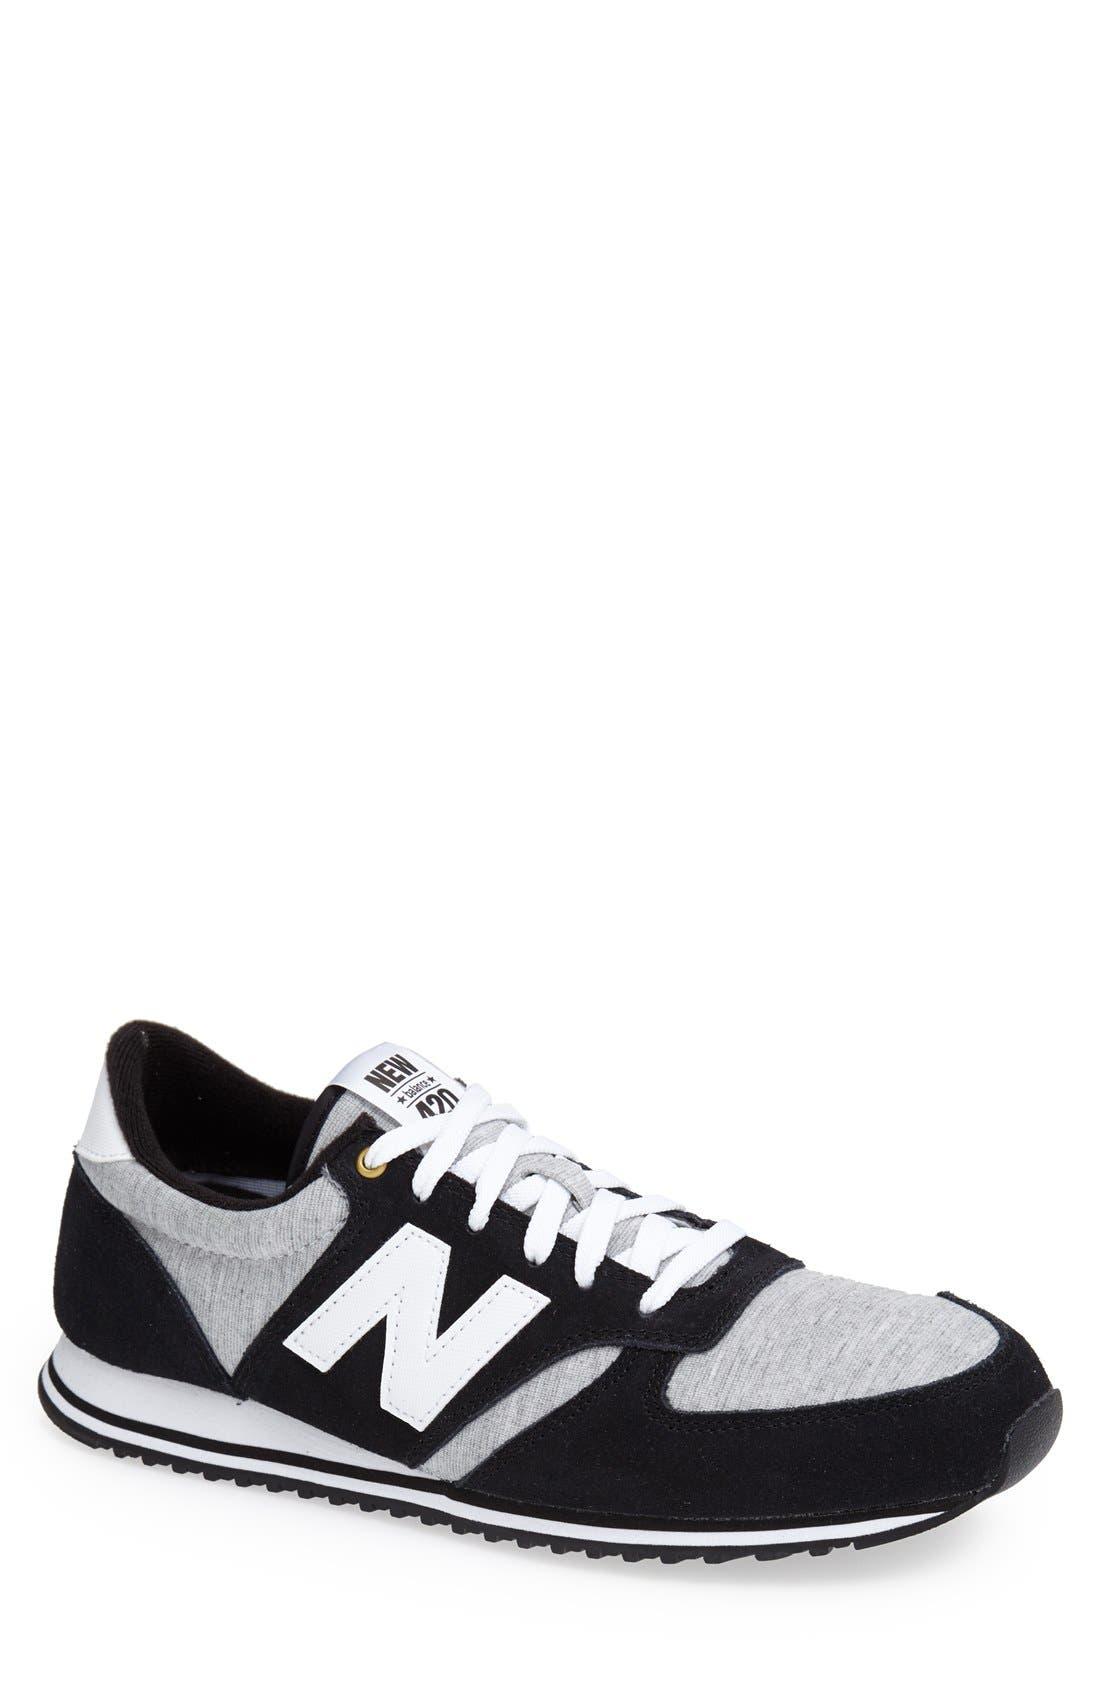 Alternate Image 1 Selected - New Balance '420' Sneaker (Men)